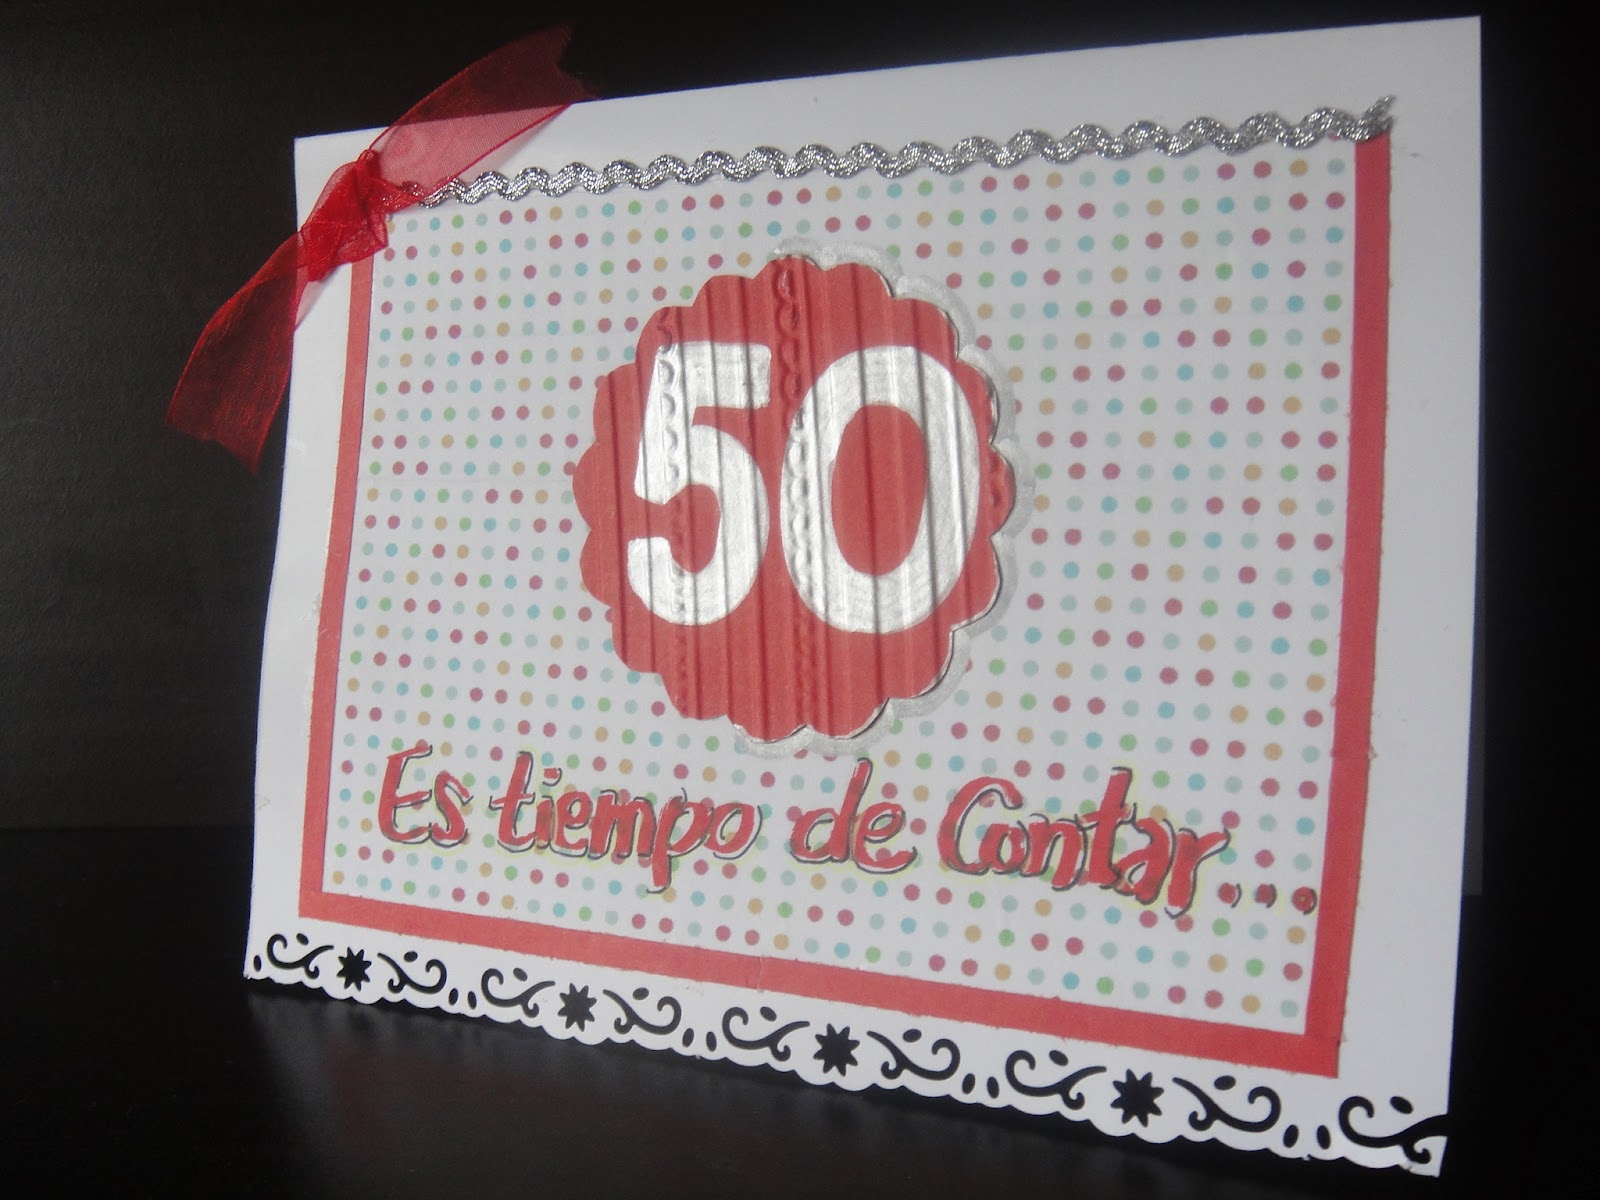 Tarjetas de cumplea os 50 a os hombre imagui - Cumpleanos 50 anos hombre ...